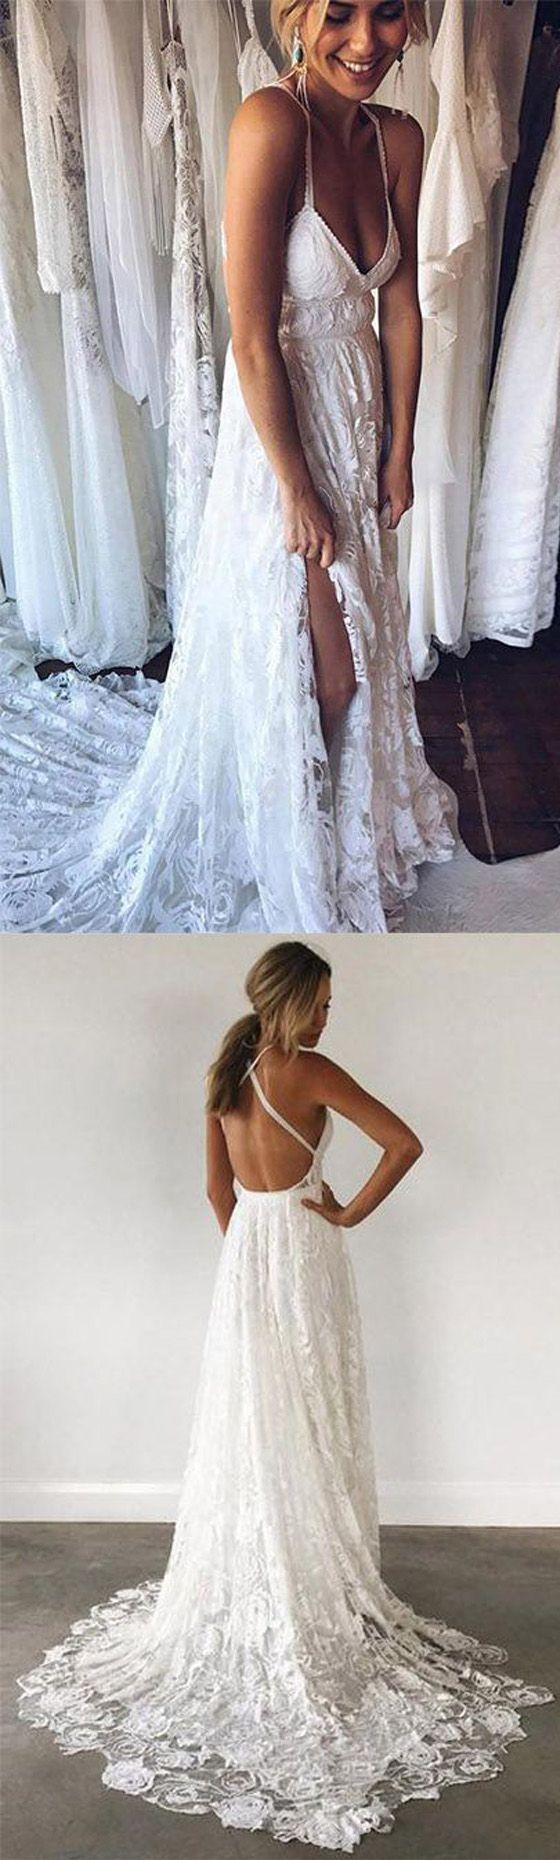 Ivory Lace Open Back Spaghetti Strap Side Split Beach Long Wedding Dresses, WG1245 #weddingdress #brides